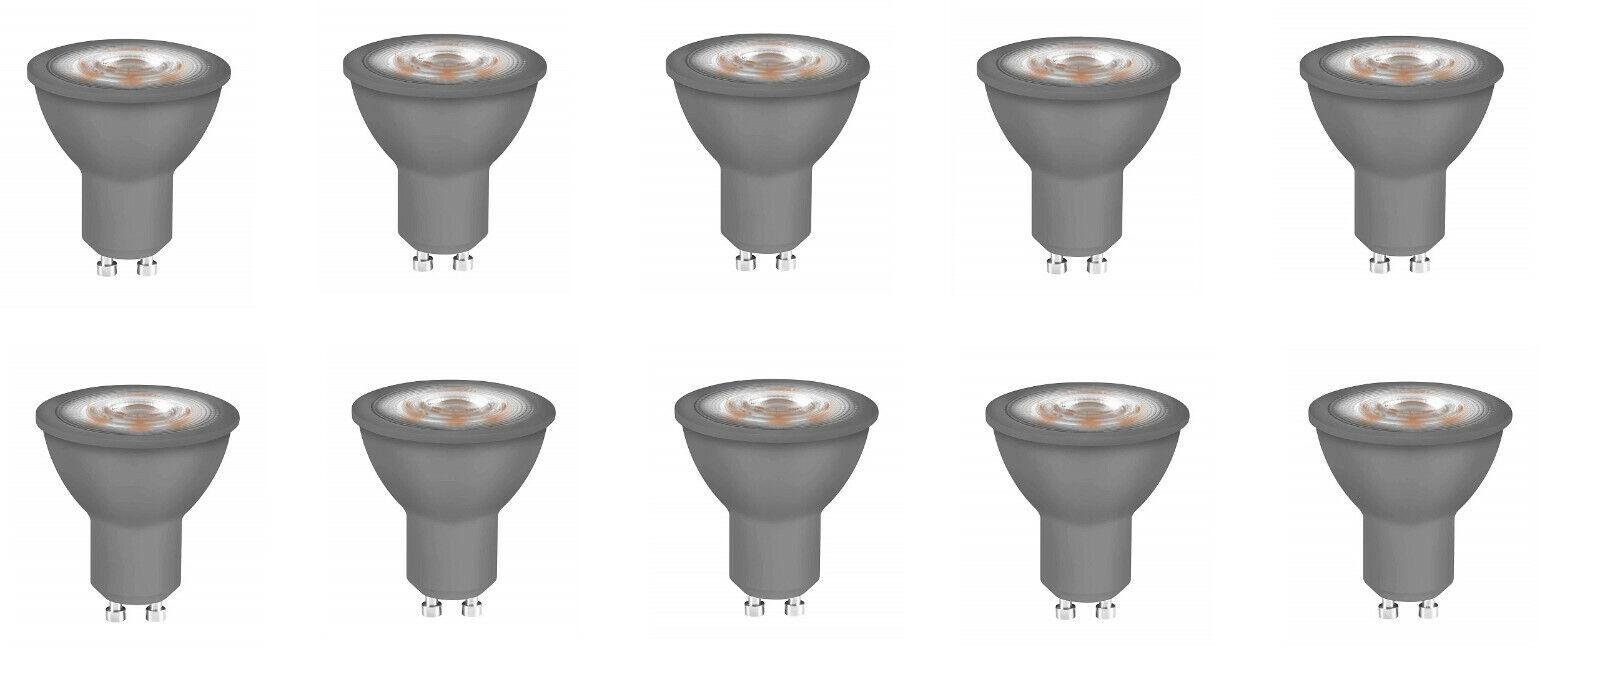 10x Neolux LED Reflektorlampen GU10 kaltweiß 4,7W=50W EEK A+ (Spektrum A++bis E)